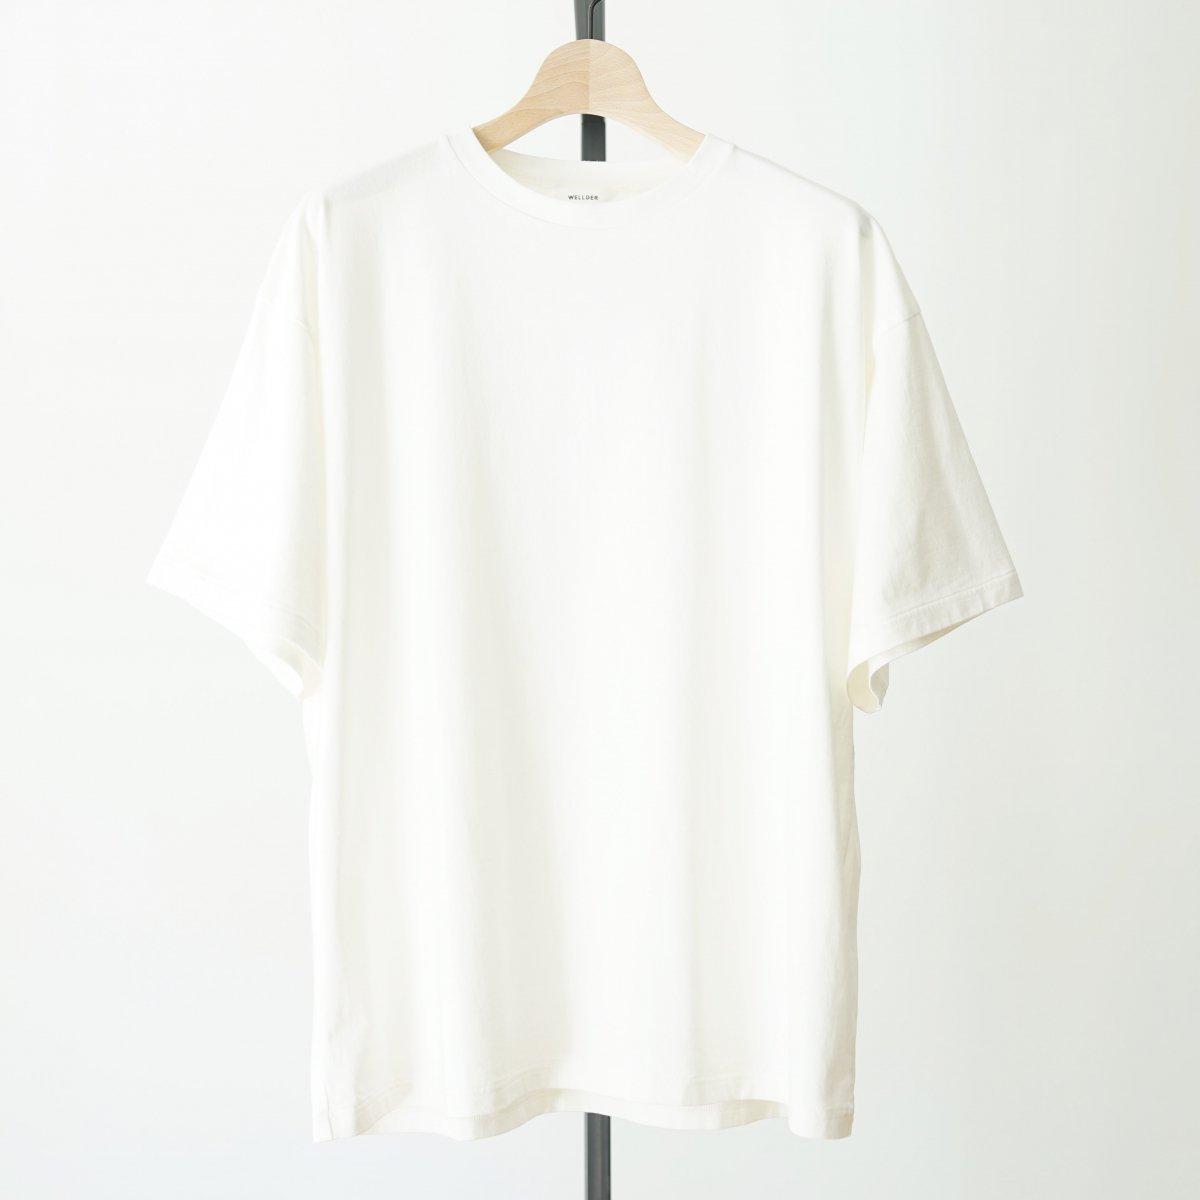 【WELLDER】CREW NECK T-SHIRT - WHITE